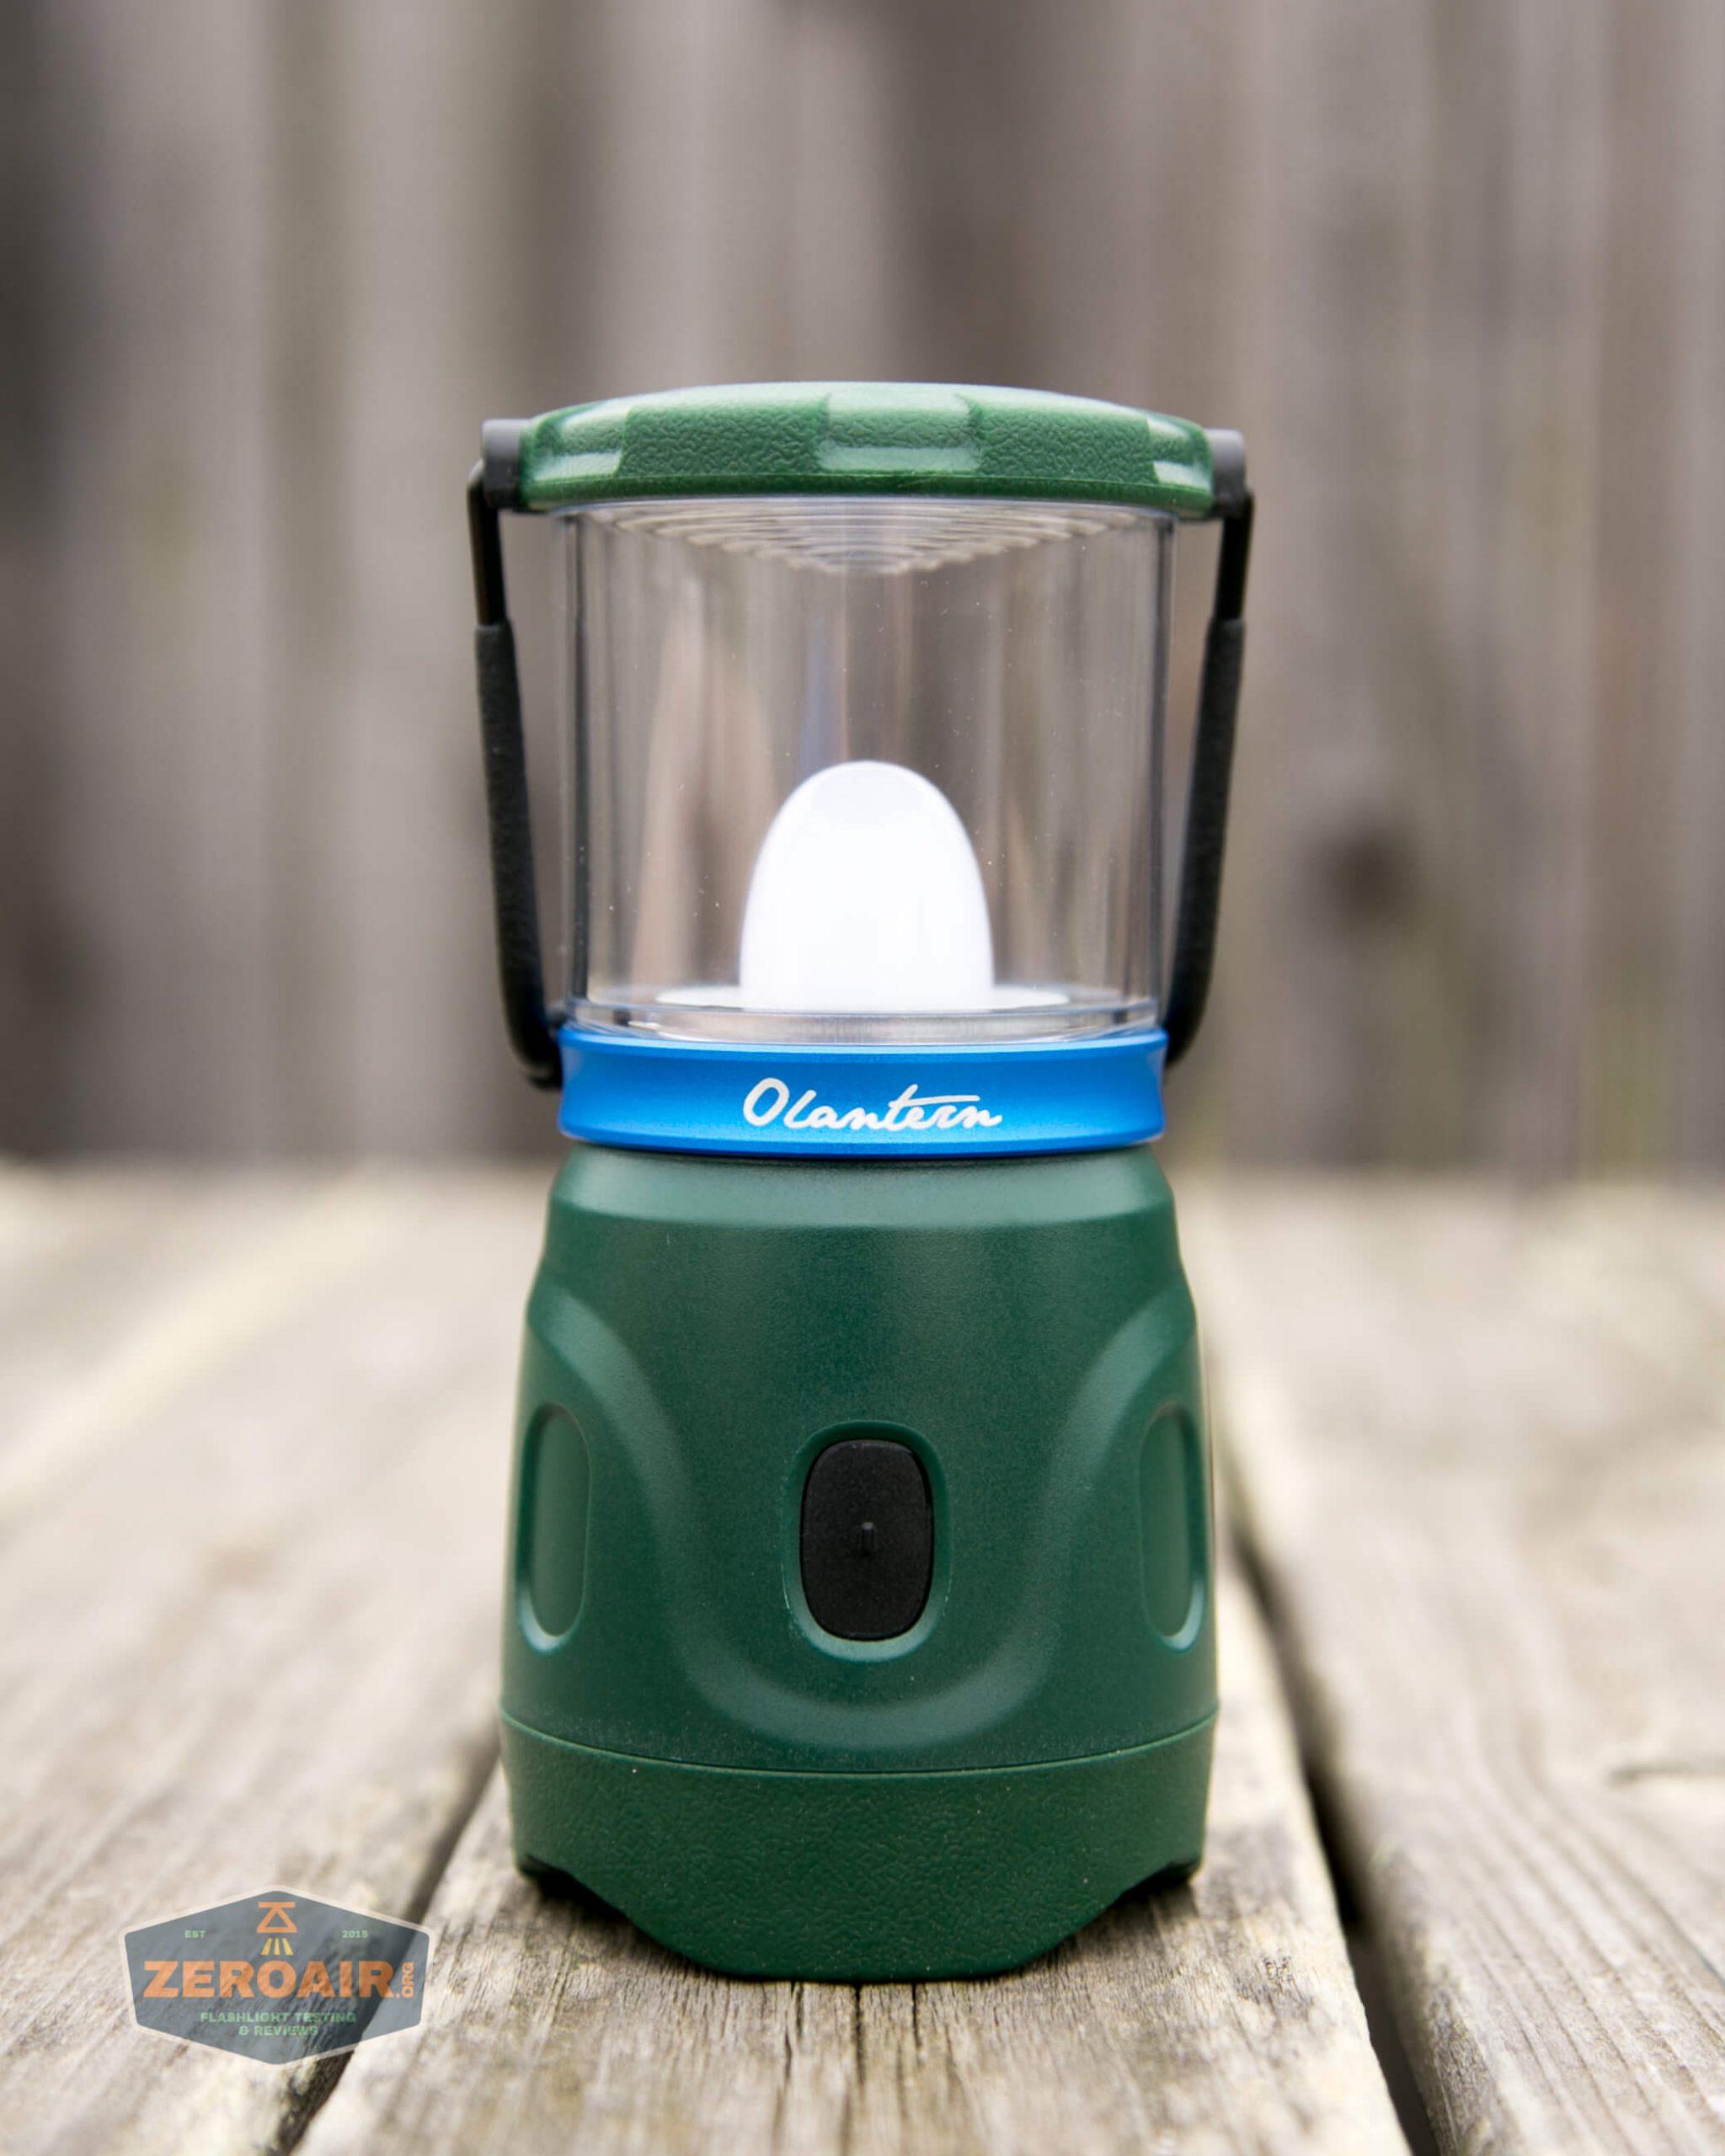 olight olantern lantern quarter shot front